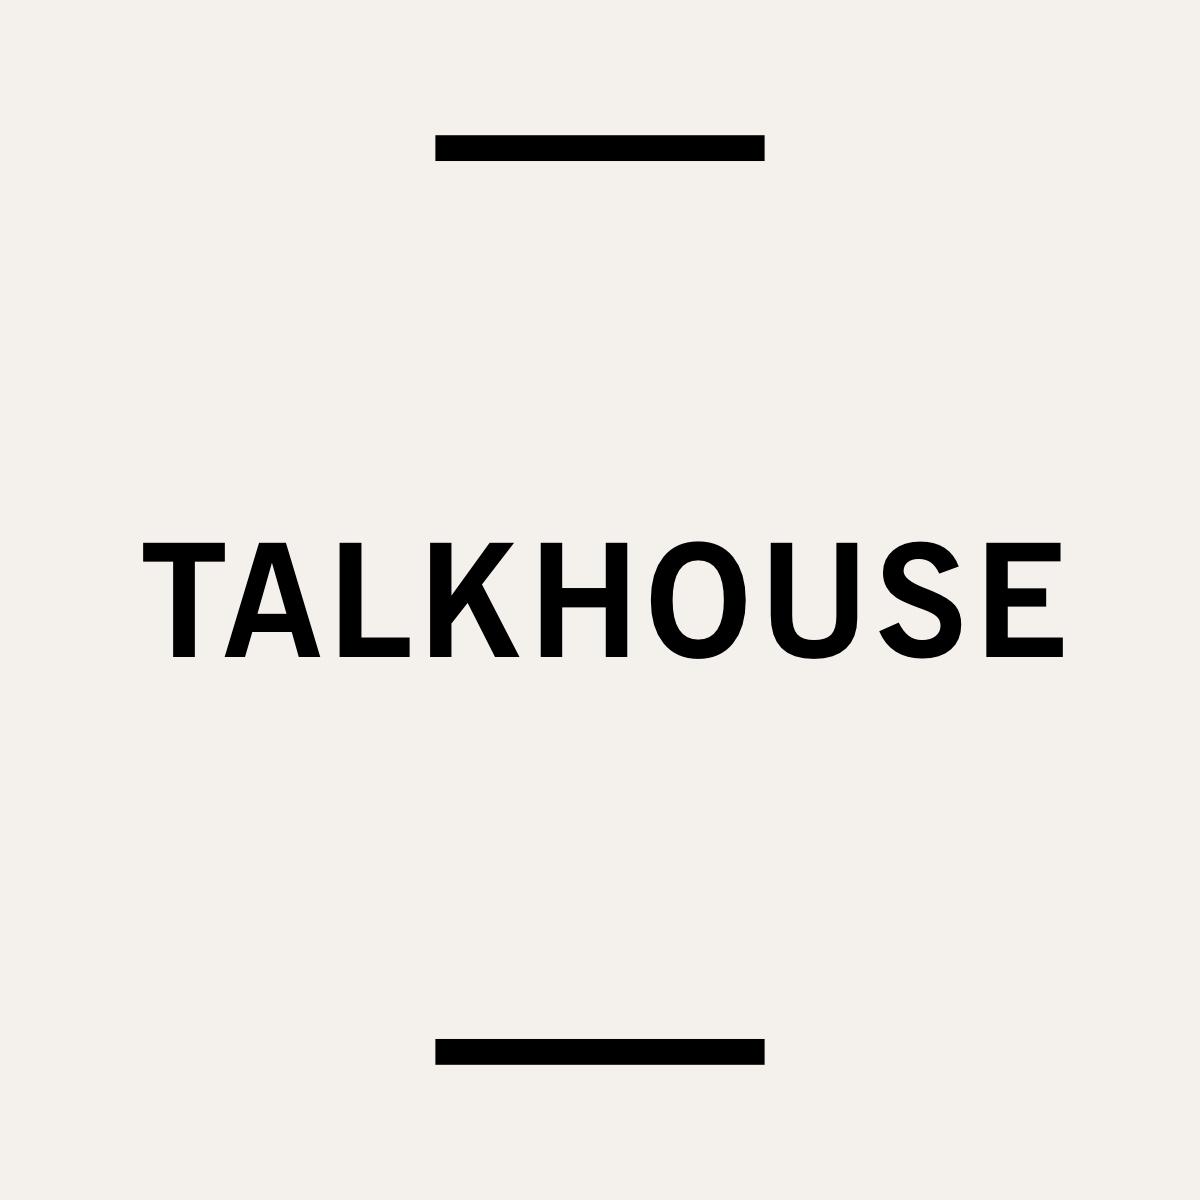 Talkhouse.jpg